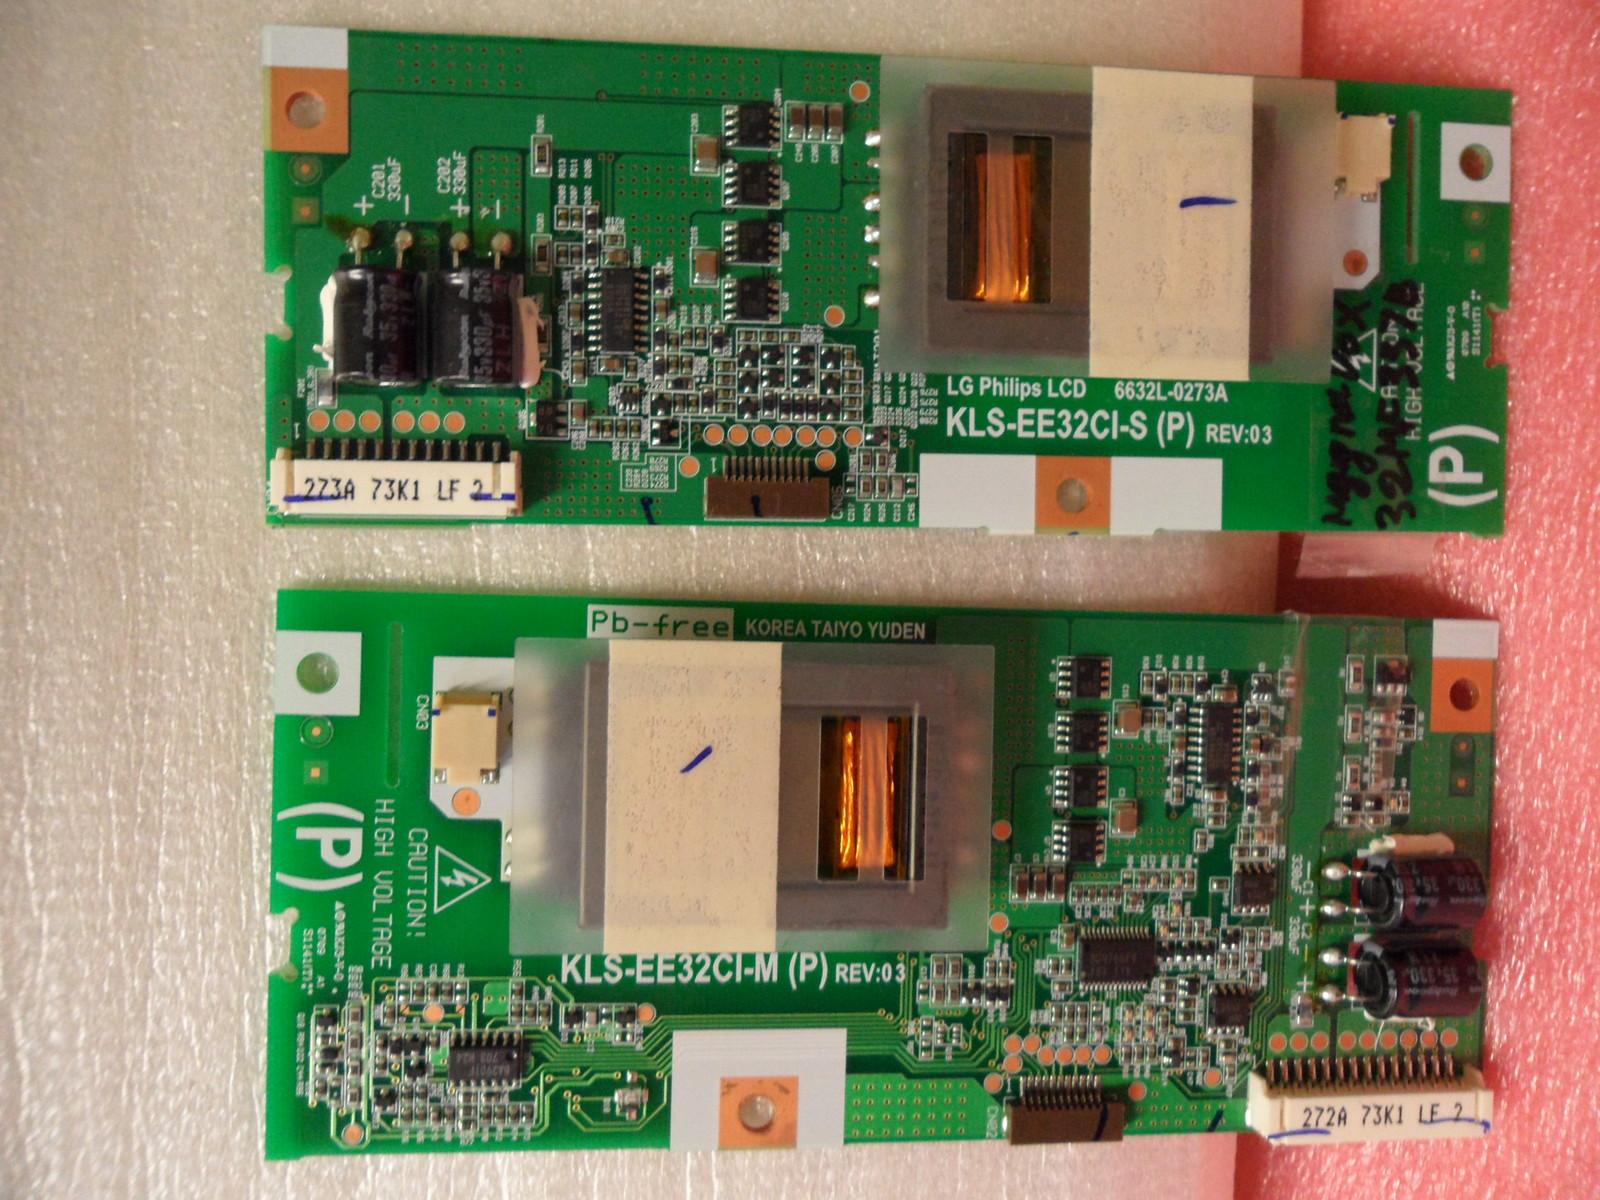 Philips 6632L-0272A & 6632L-0273A Backlight Inverter Boards - $24.95